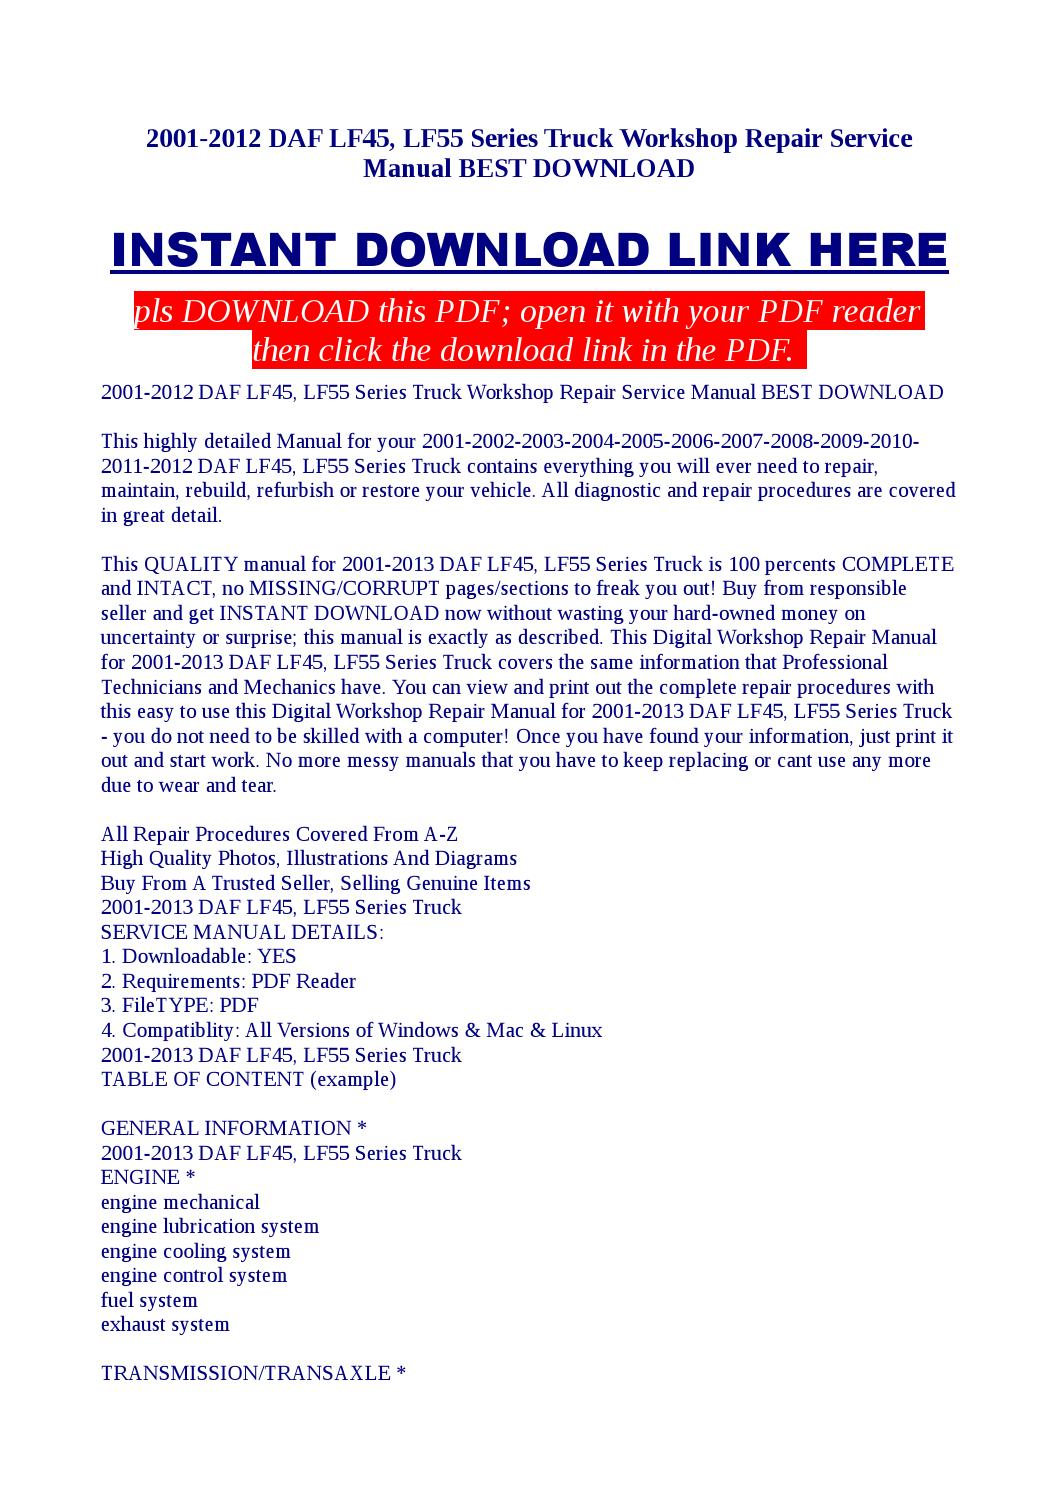 2001 2012 daf lf45, lf55 series truck workshop repair service manual best  download by Kato Syomo - issuu